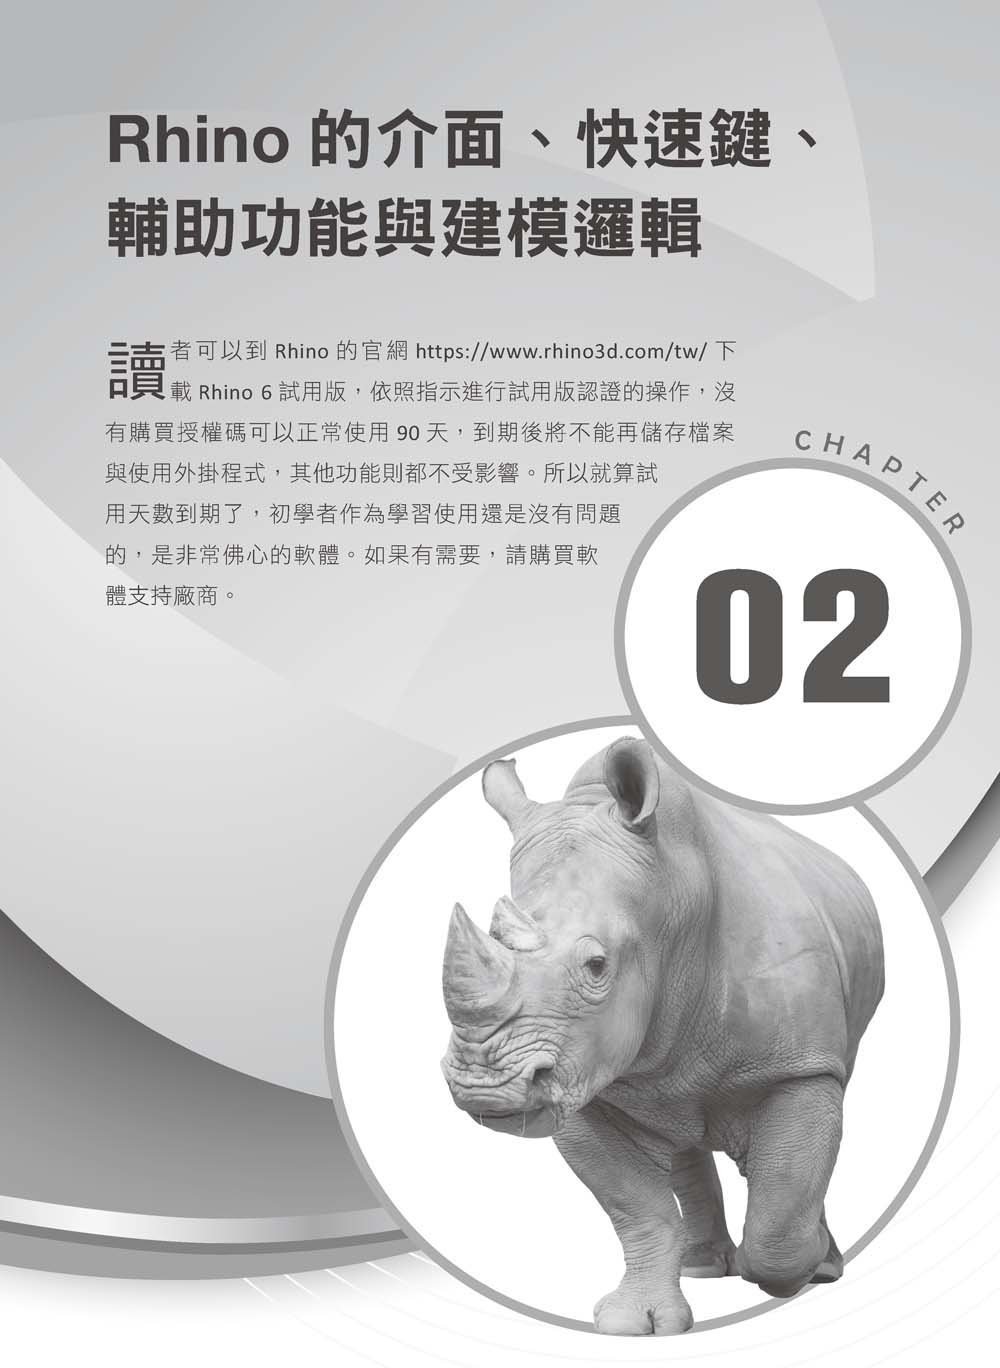 Rhinoceros 6 全攻略:自學設計與 3D建模寶典-preview-16